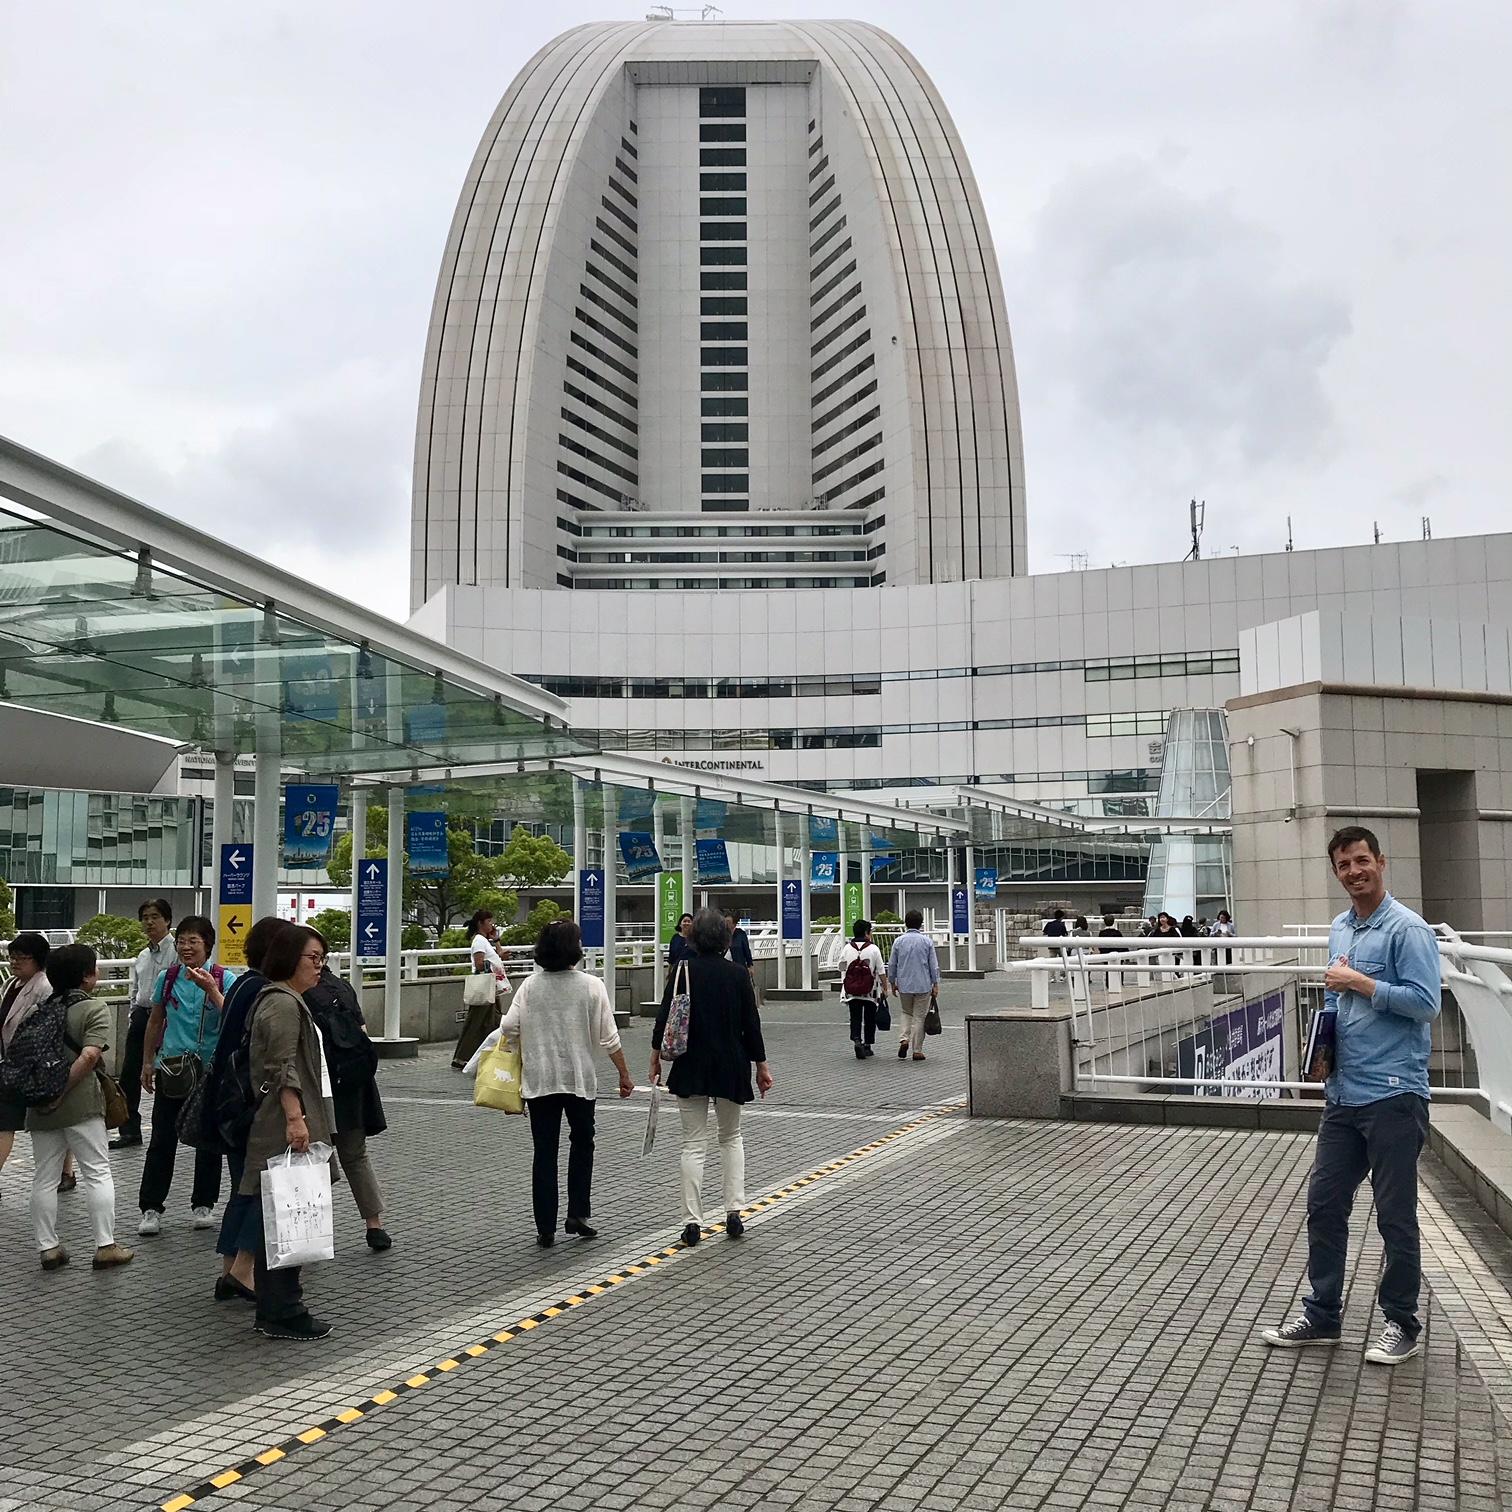 We stayed at the Intercontinental Hotel Yokohoma.